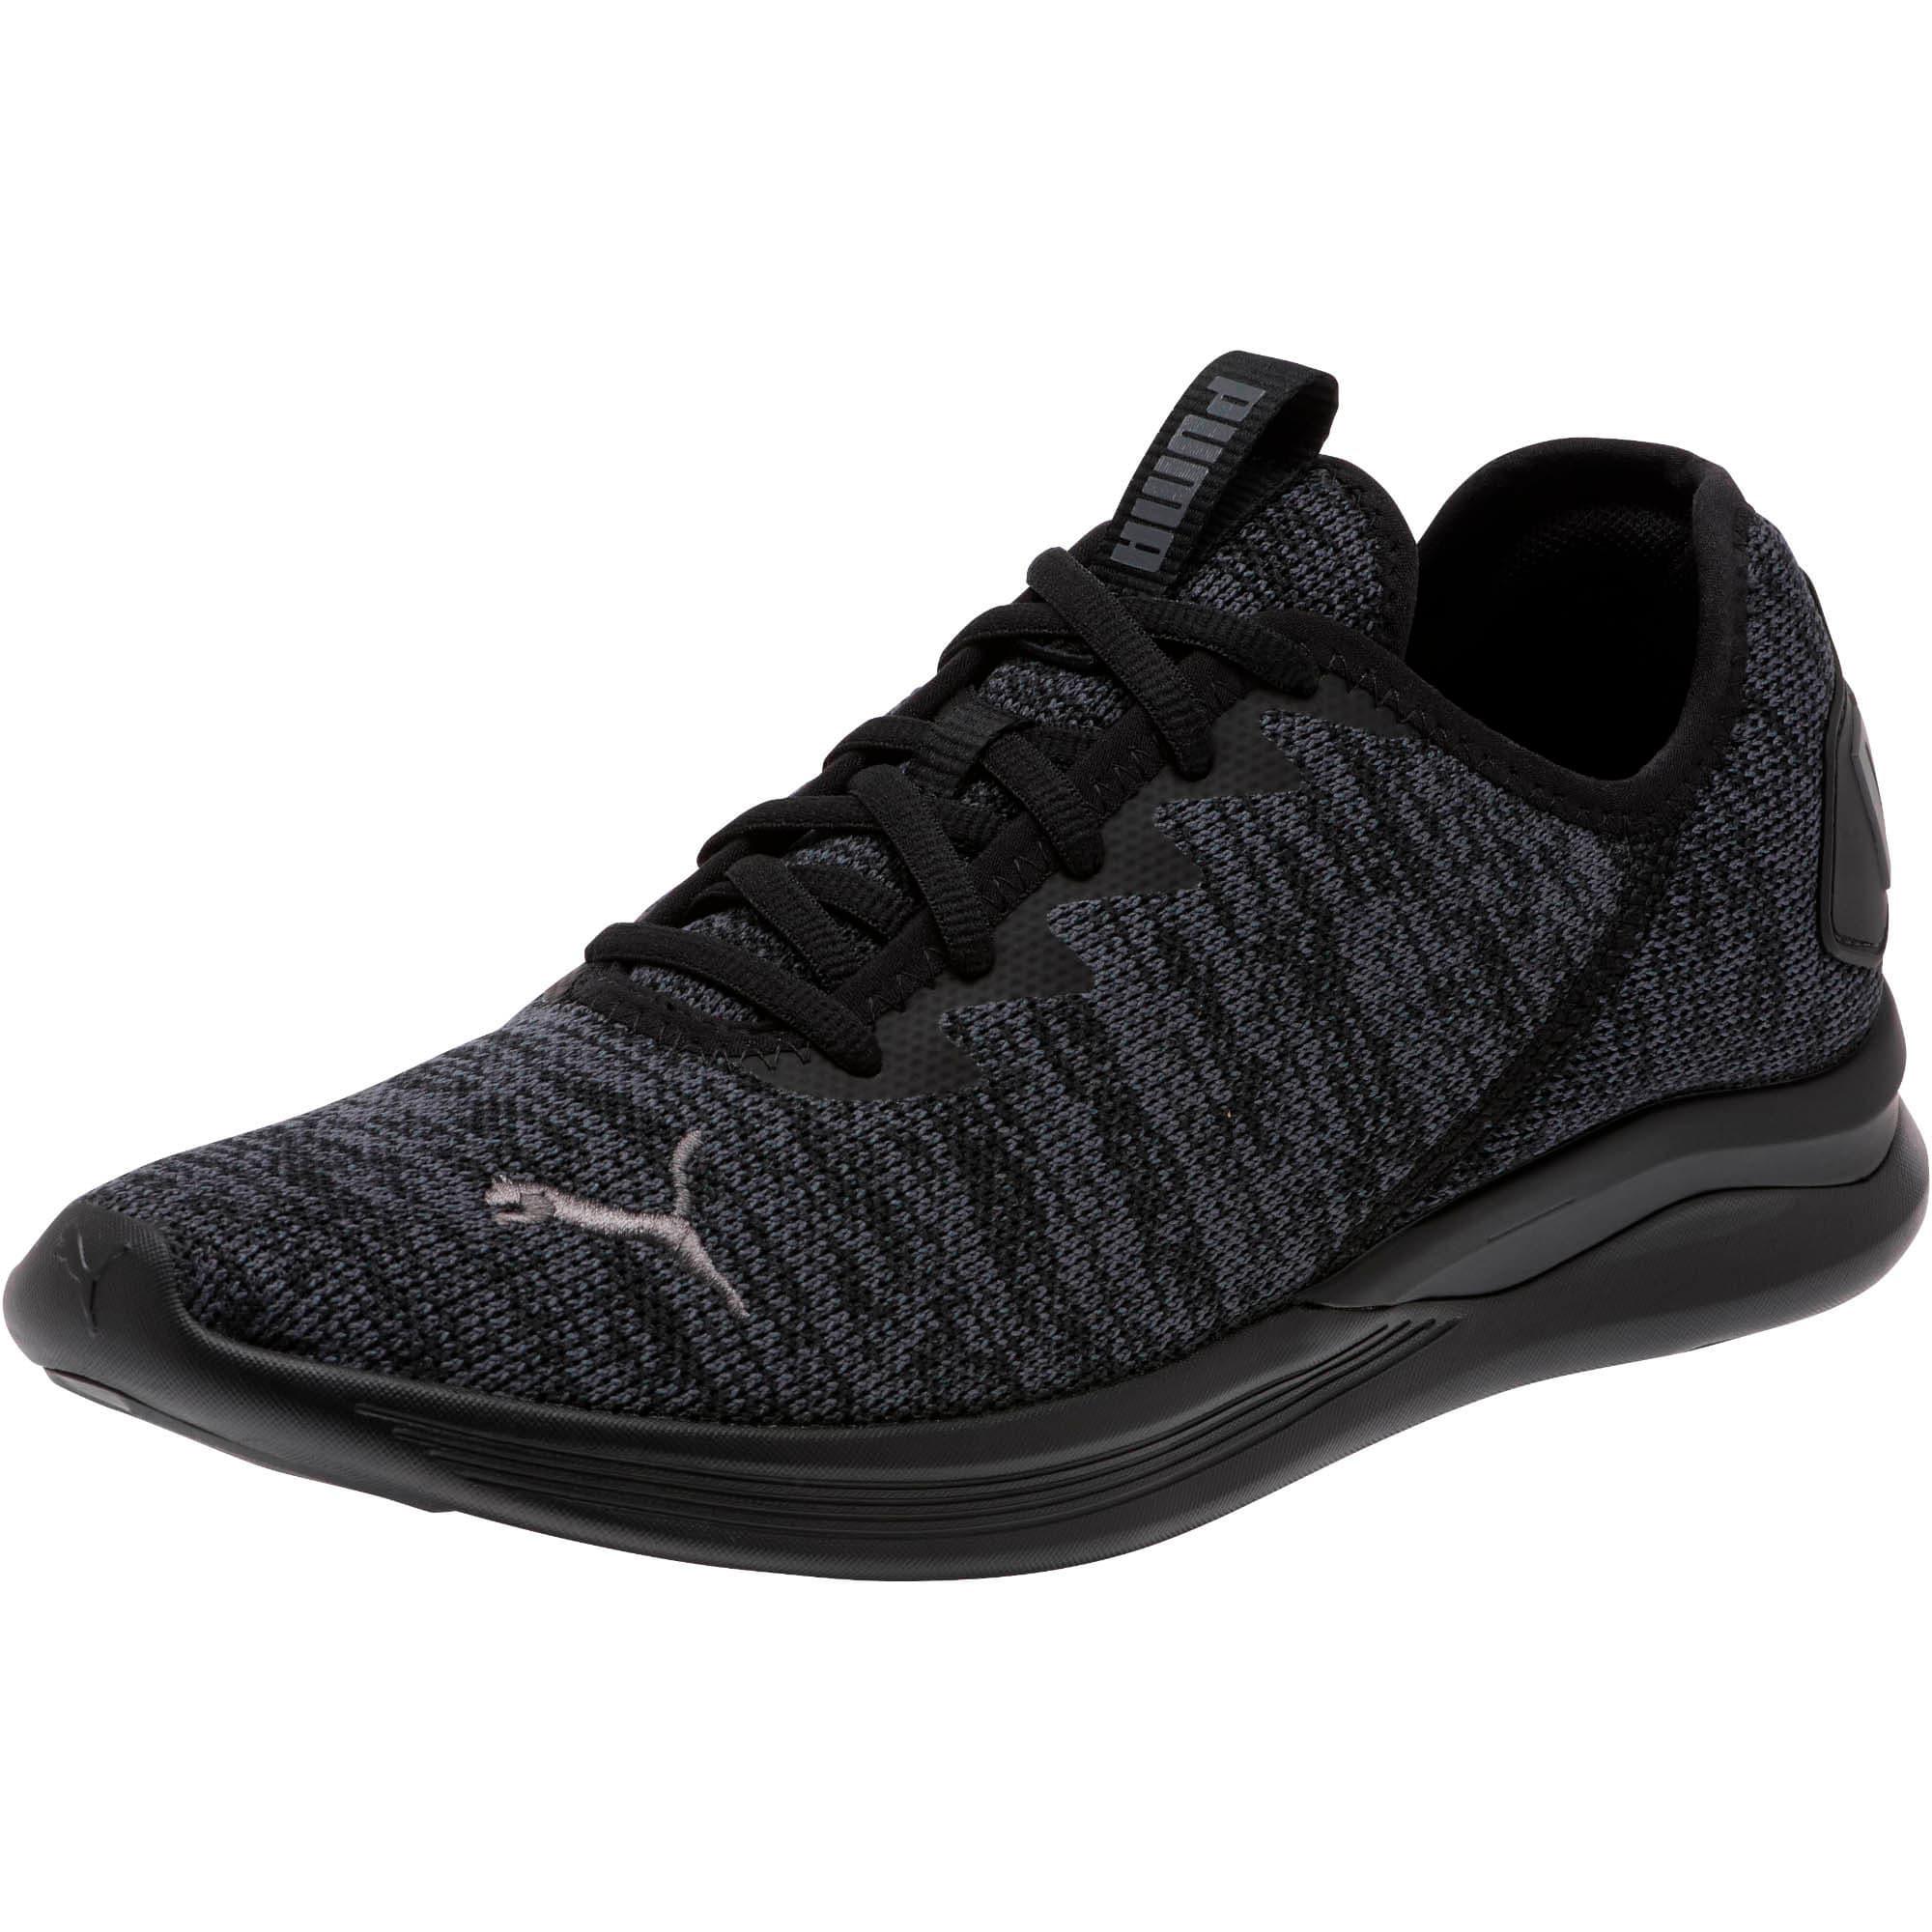 Thumbnail 1 of Ballast Men's Running Shoes, Puma Black-Iron Gate, medium